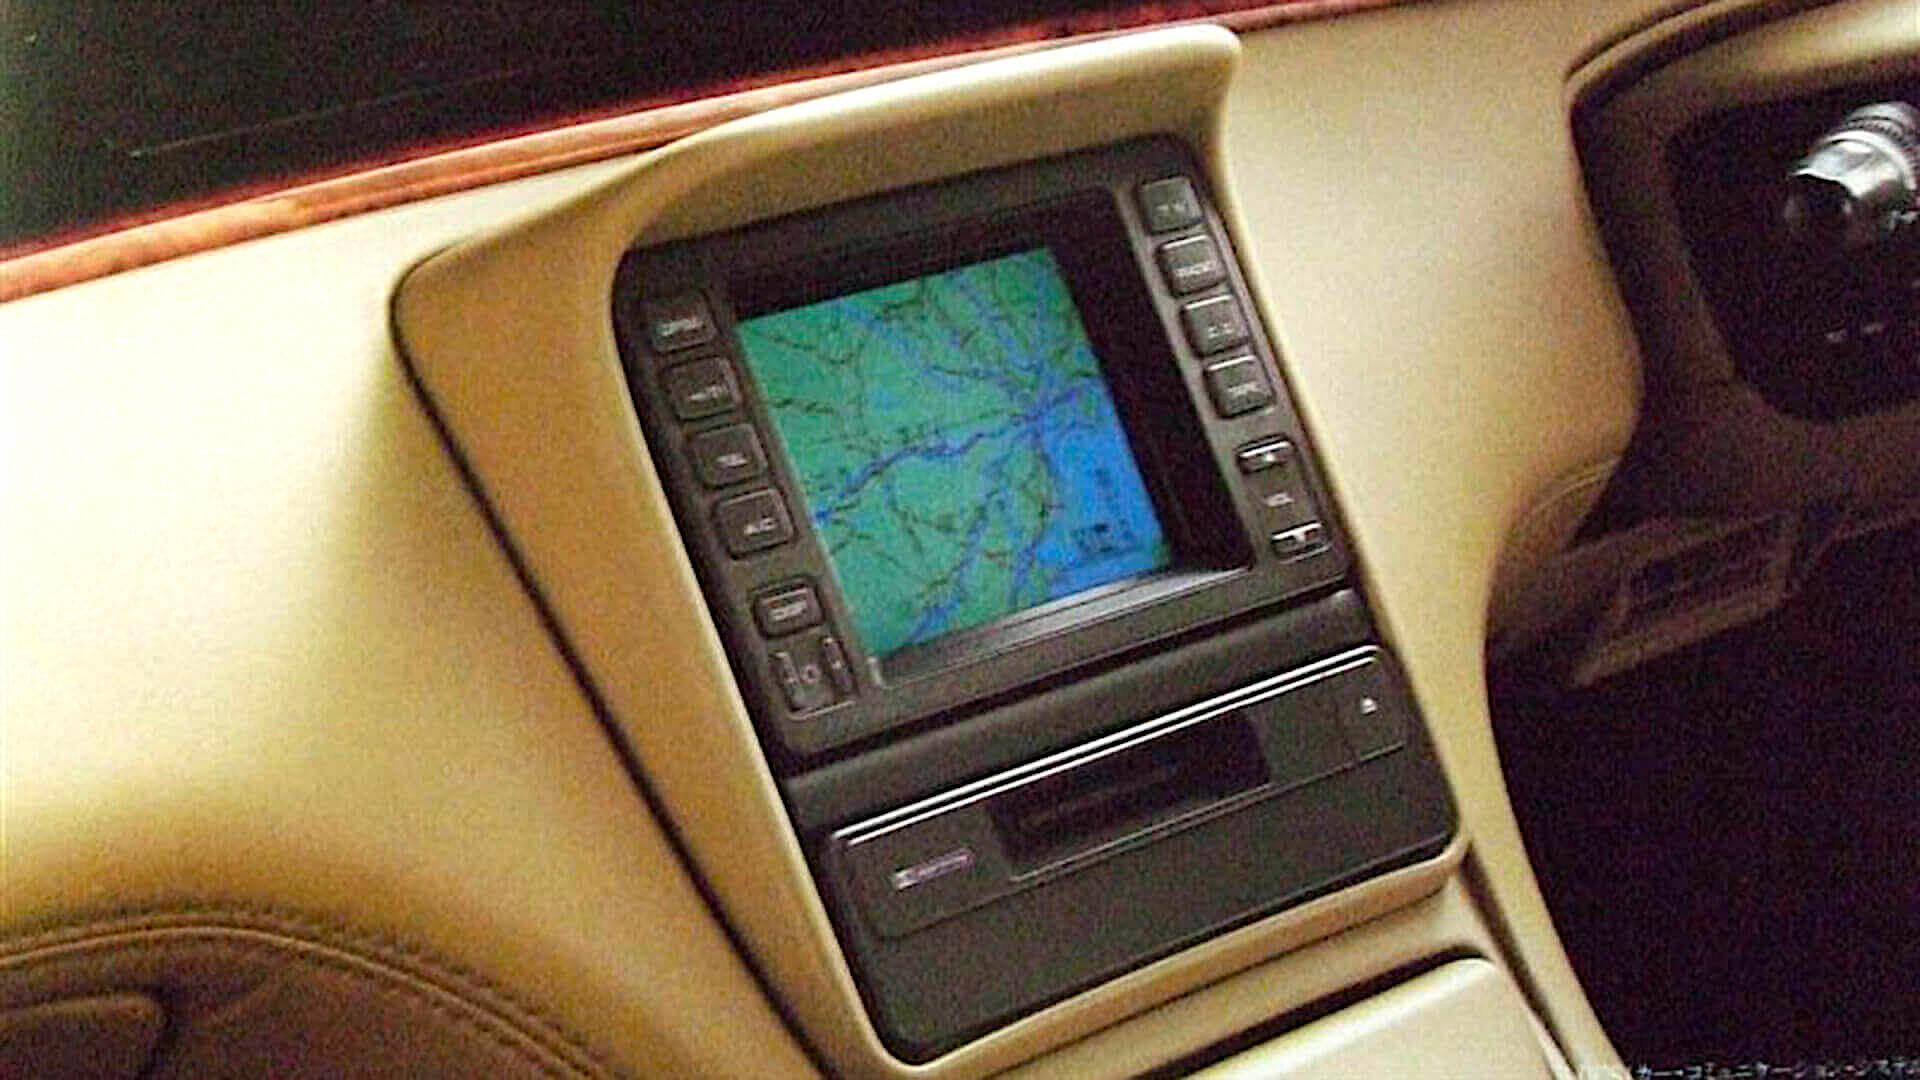 1990 Mazda Eunos Cosmo - nawigacja GPS